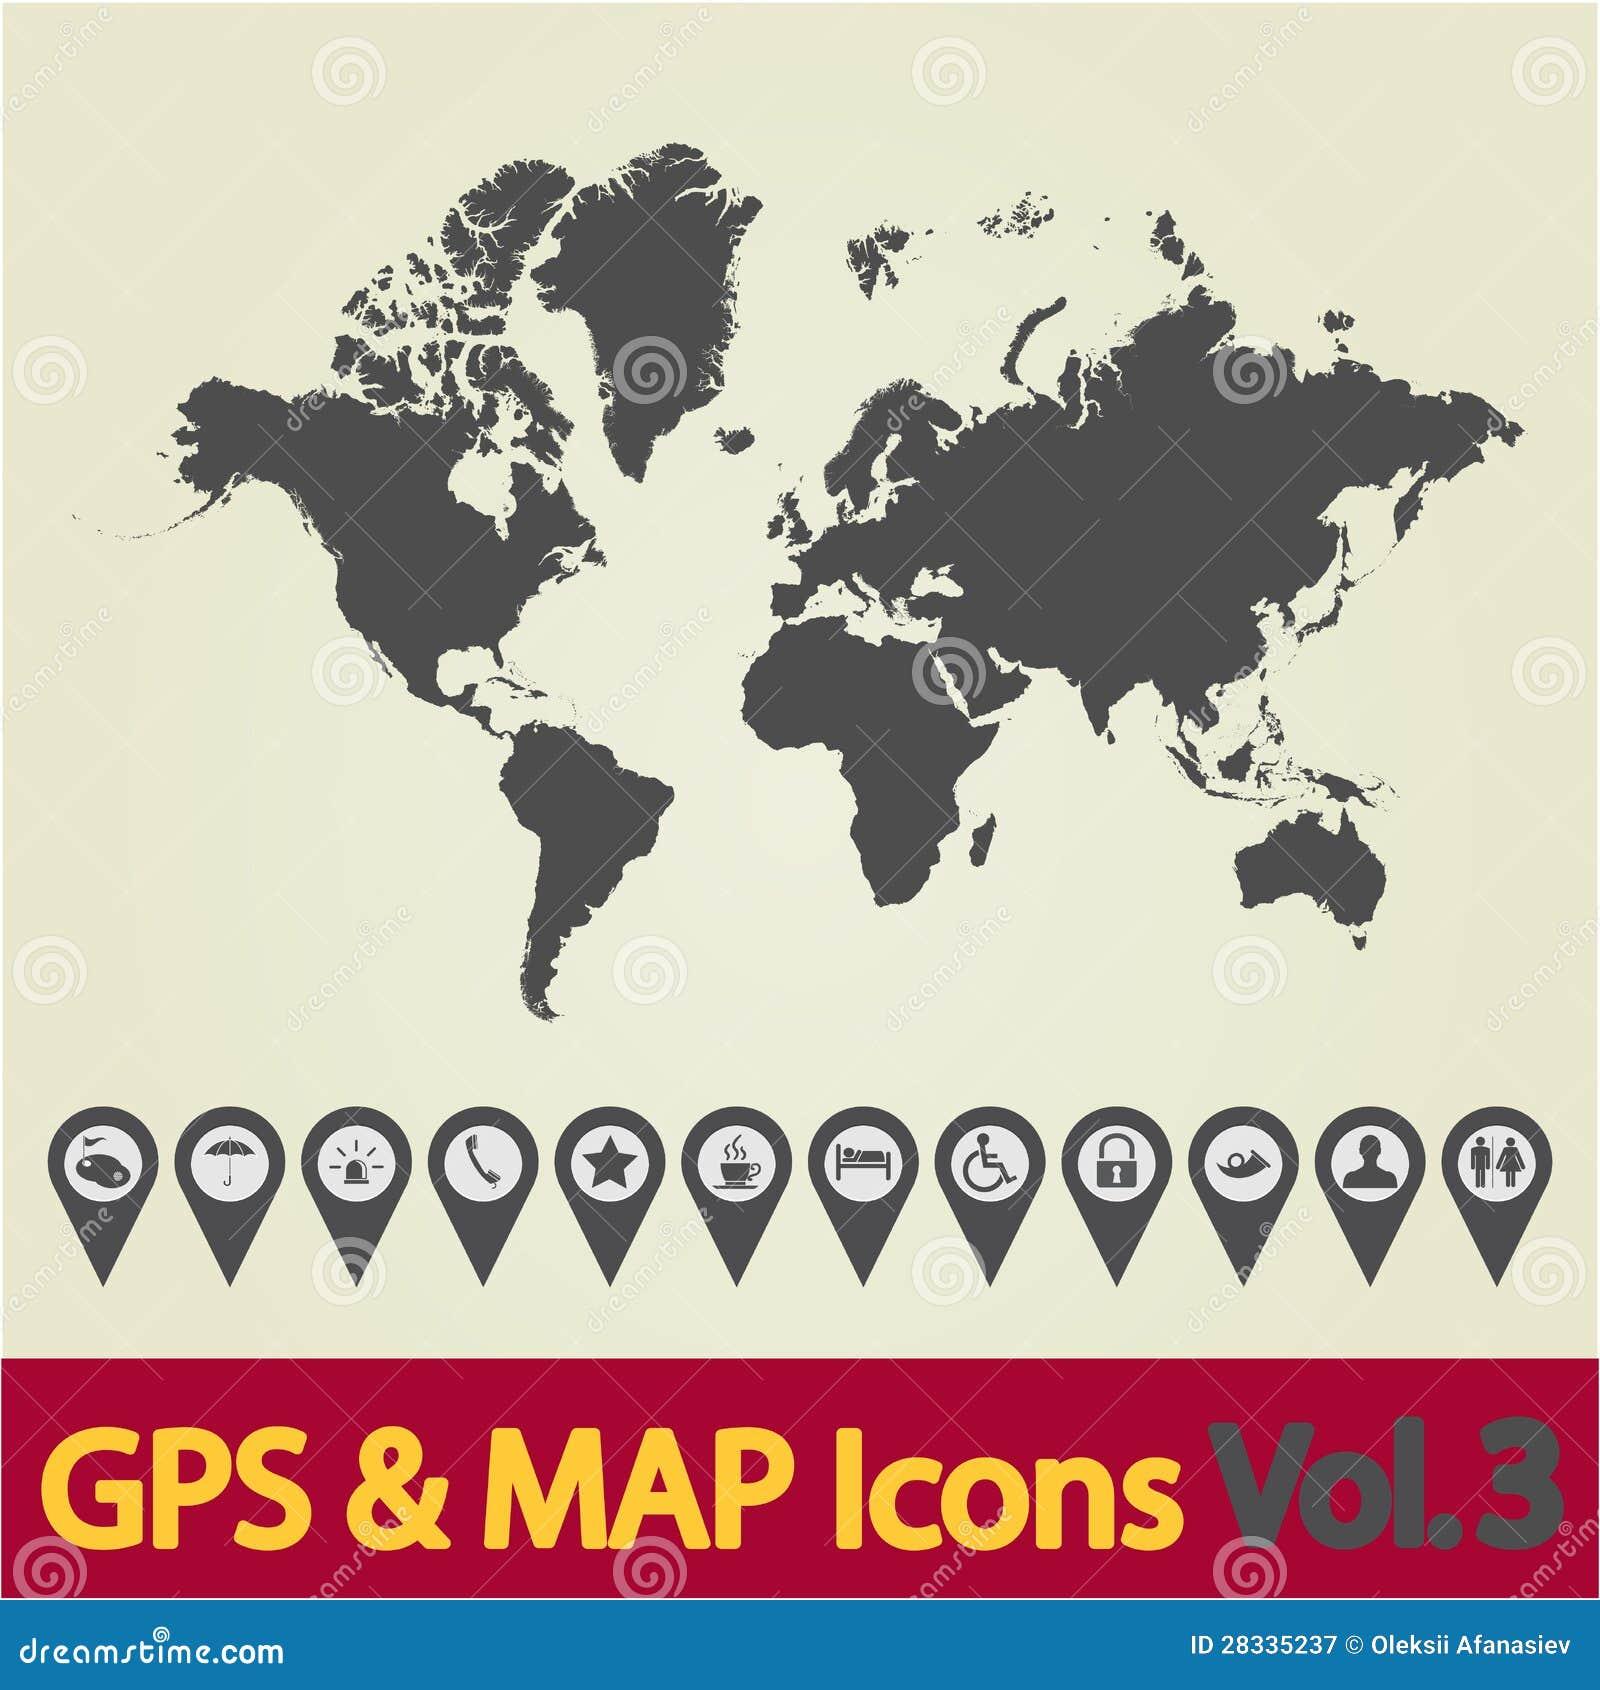 World map icon 3 stock vector illustration of illustration 28335237 world map icon 3 gumiabroncs Images